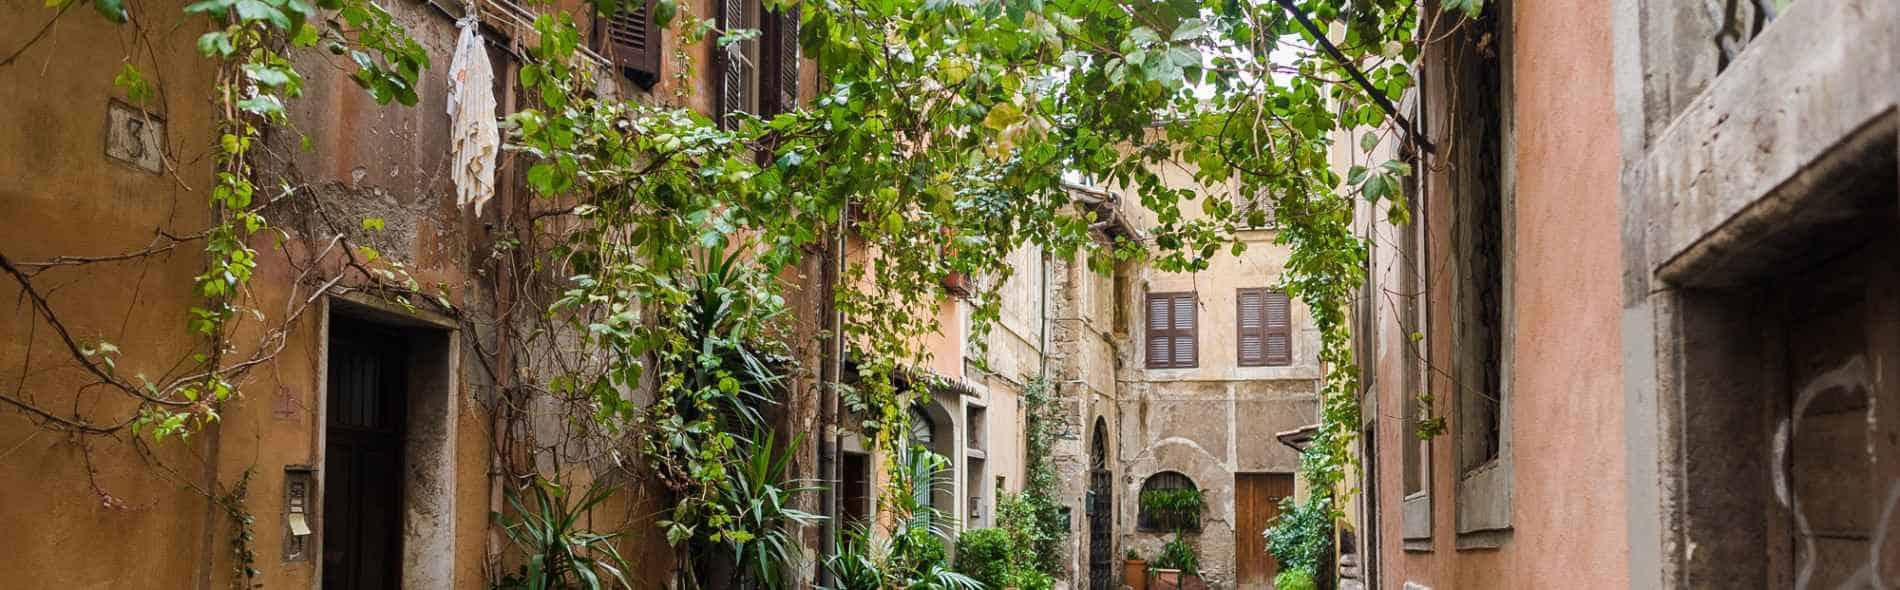 Trastevere, expert private tour guide